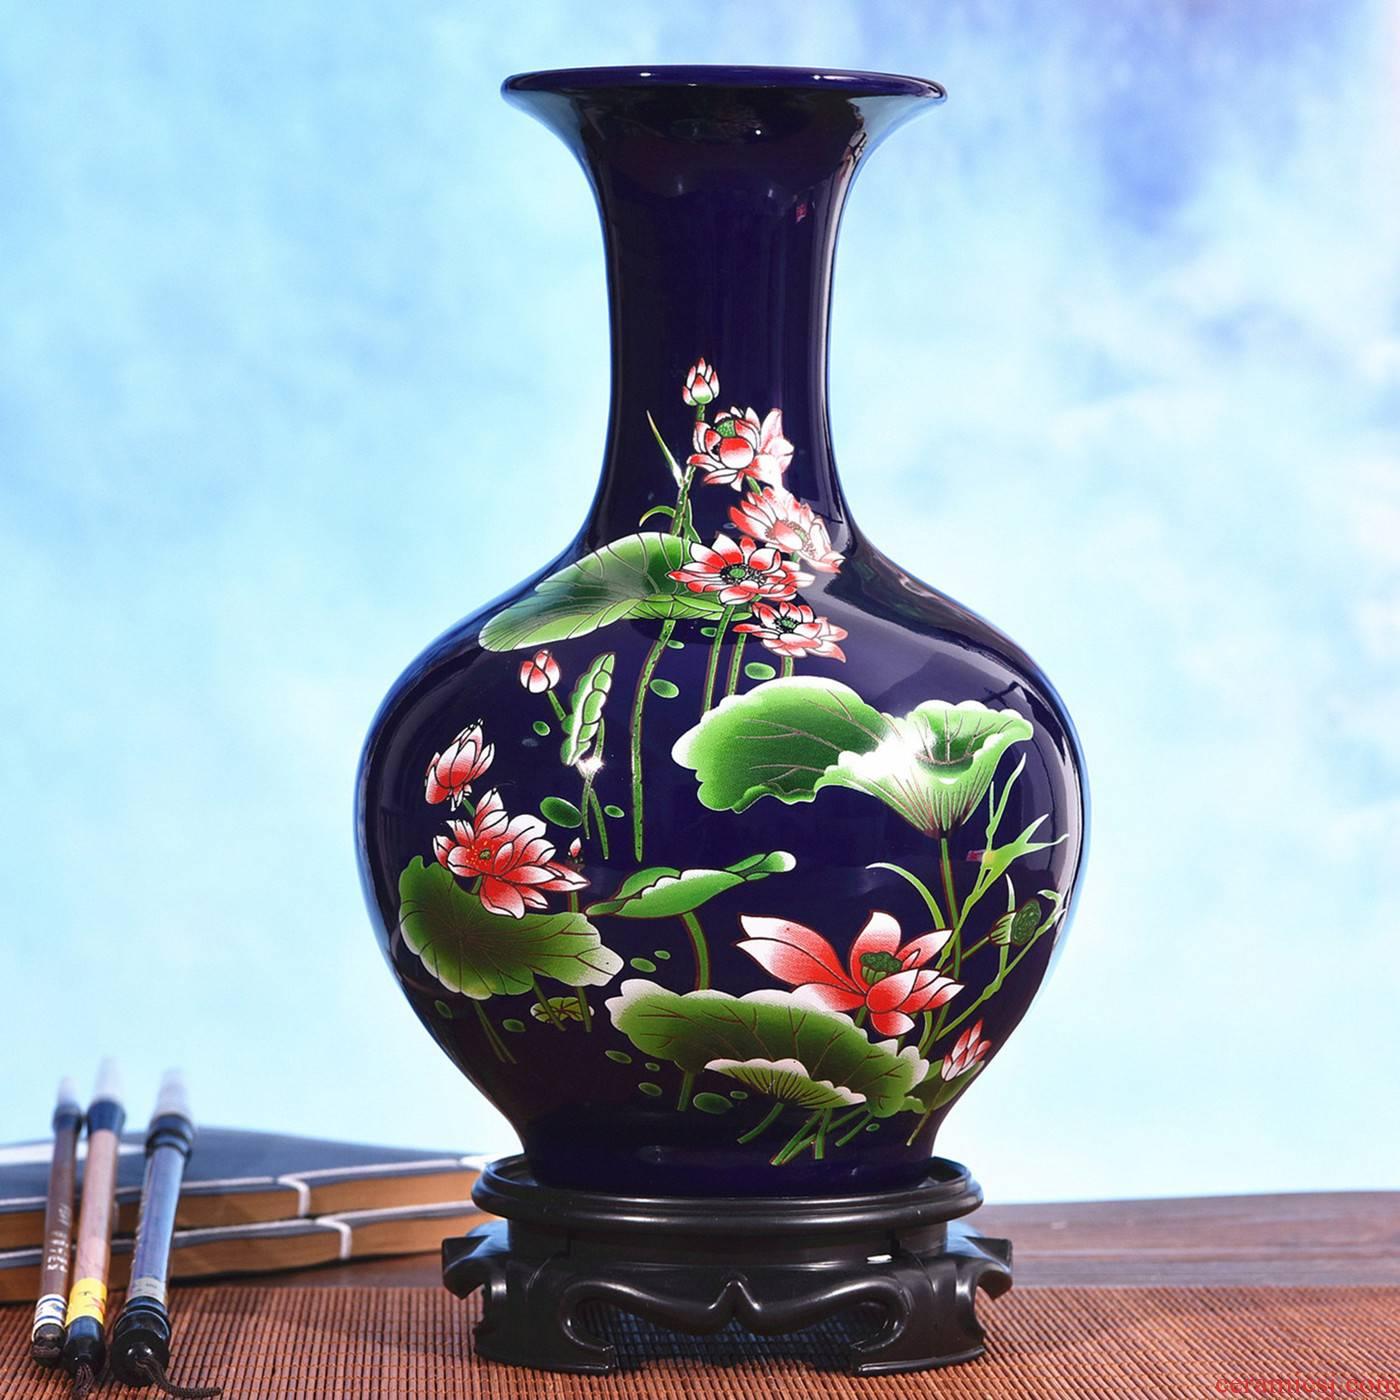 Jingdezhen ceramics XFX blue yan glaze enamel lotus flower vase household adornment handicraft furnishing articles gift